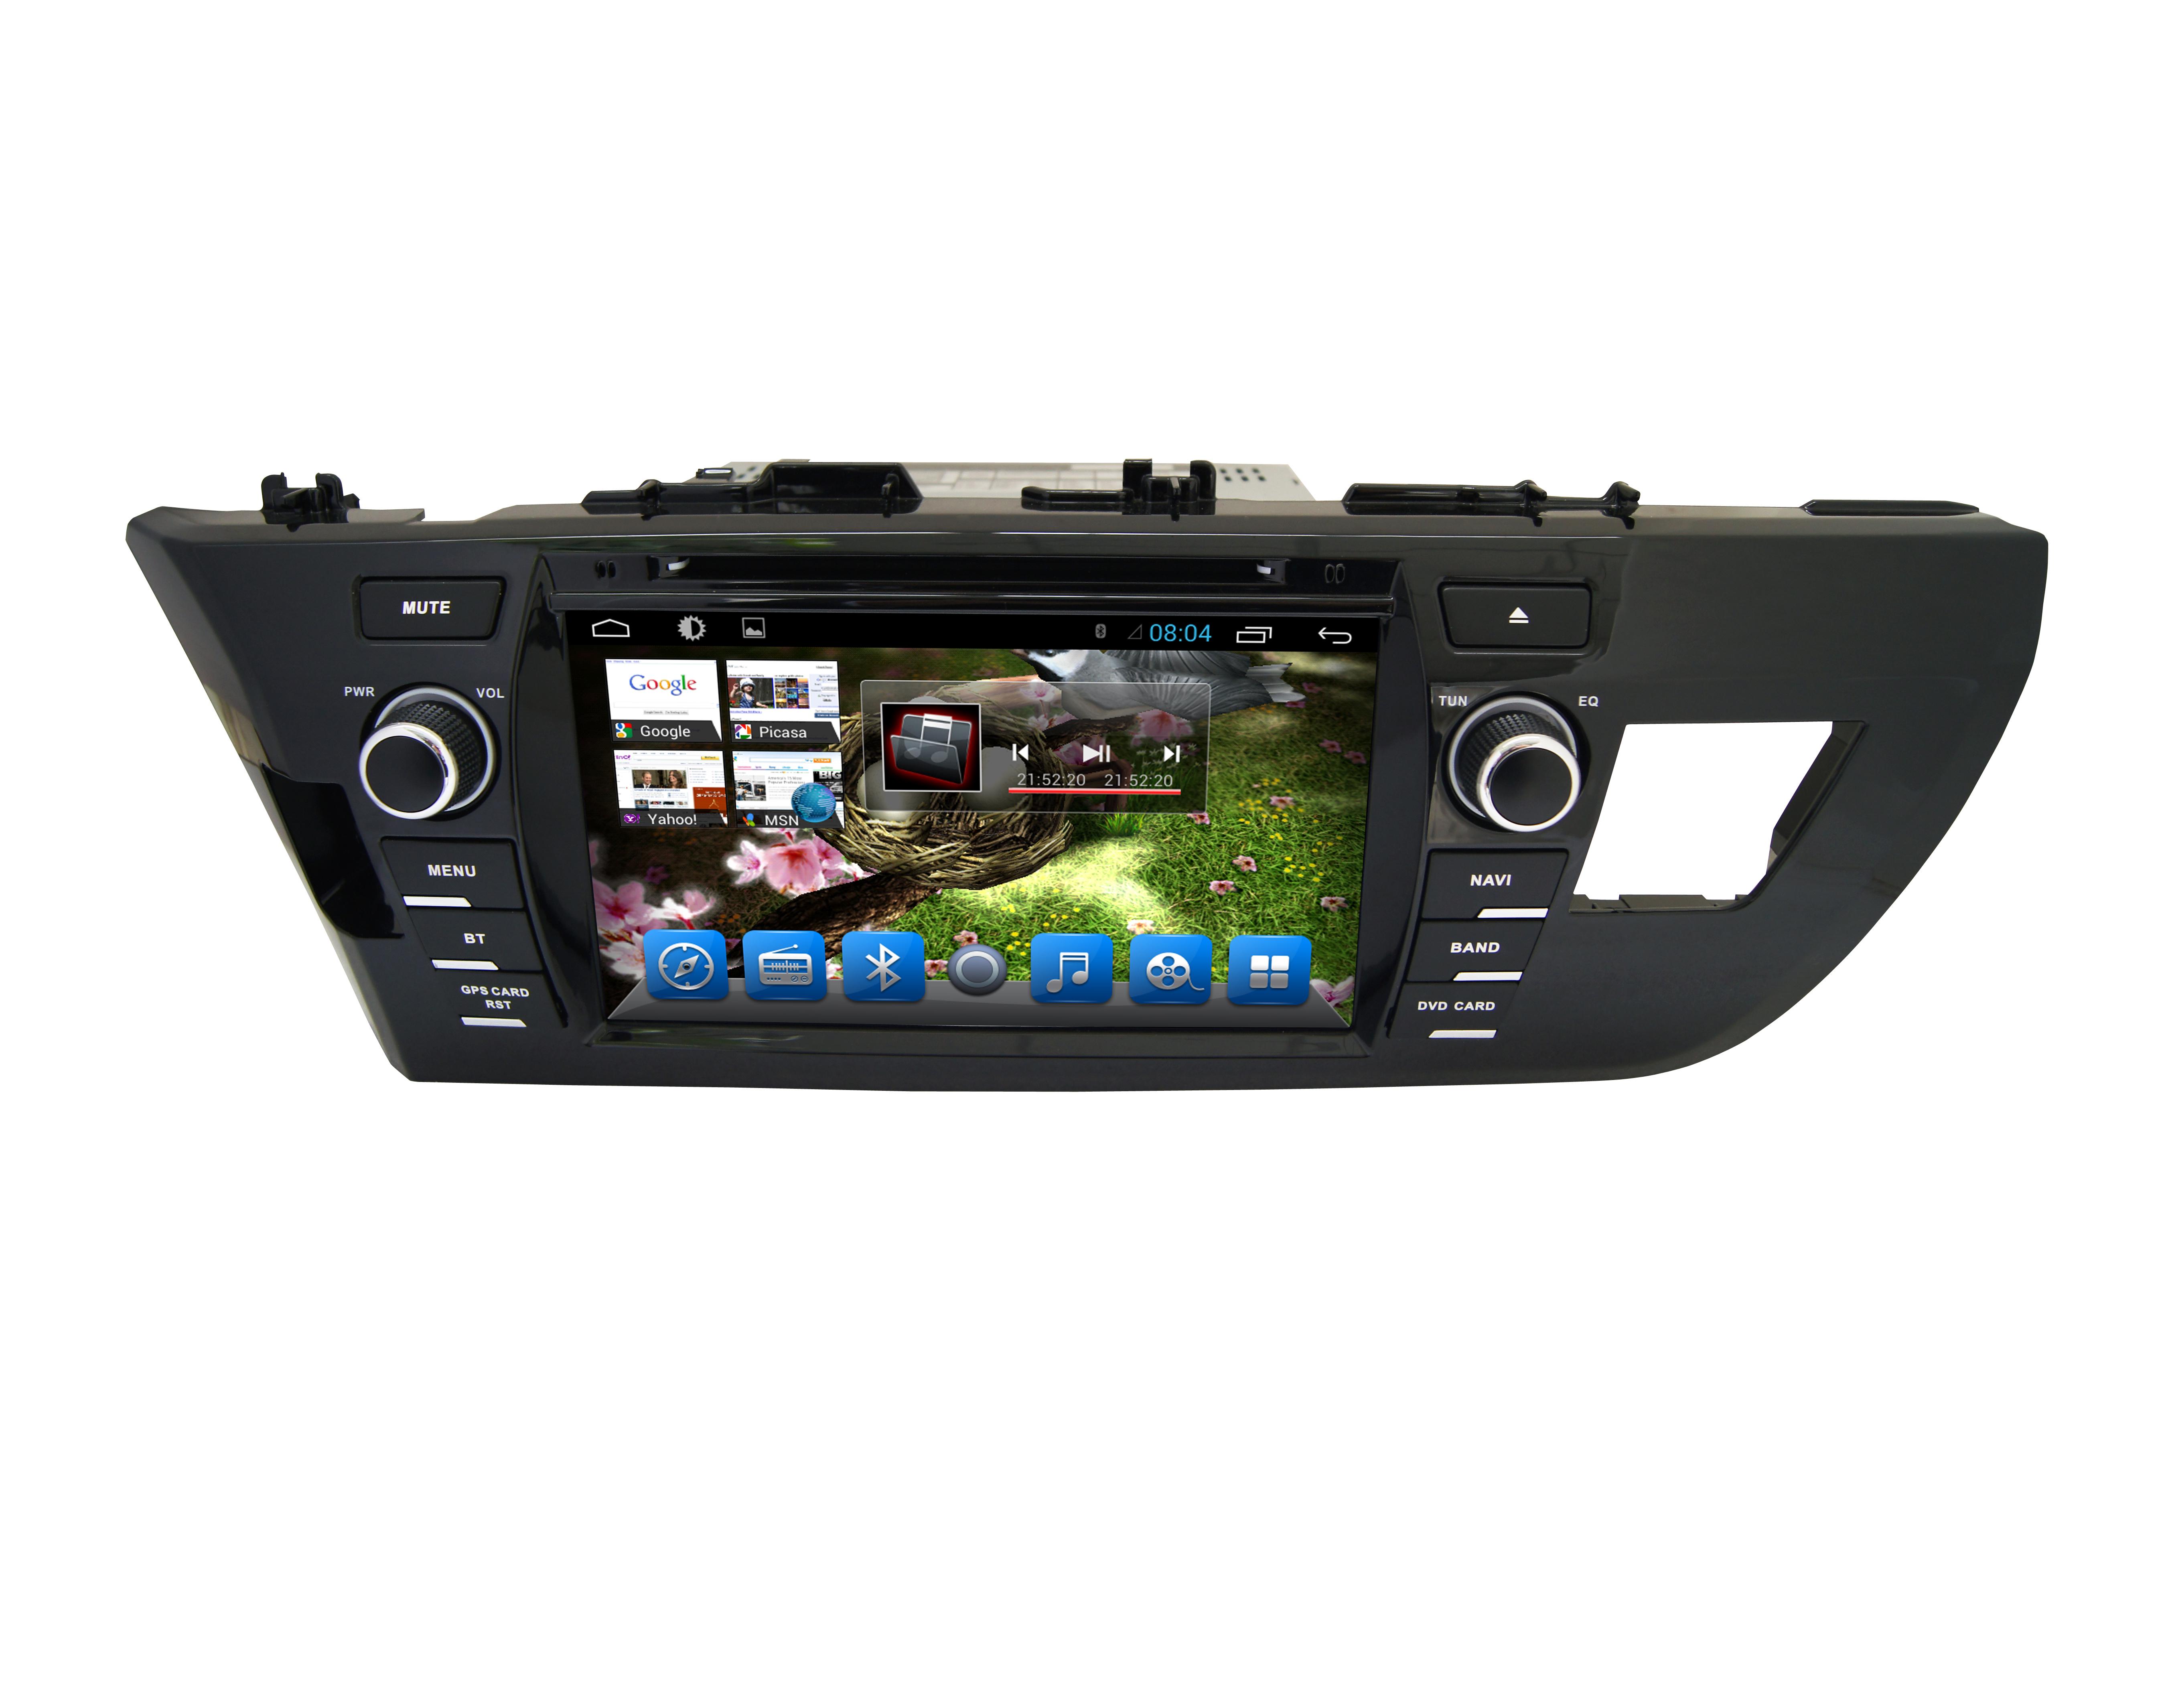 Штатная магнитола CARMEDIA QR-8090-T8 Toyota Corolla E180/E170 2013-2015 вместо штатной рамки на OC Android 7.1.2 / 8.1 штатная магнитола carmedia kdo 9406 dvd toyota corolla e180 2016